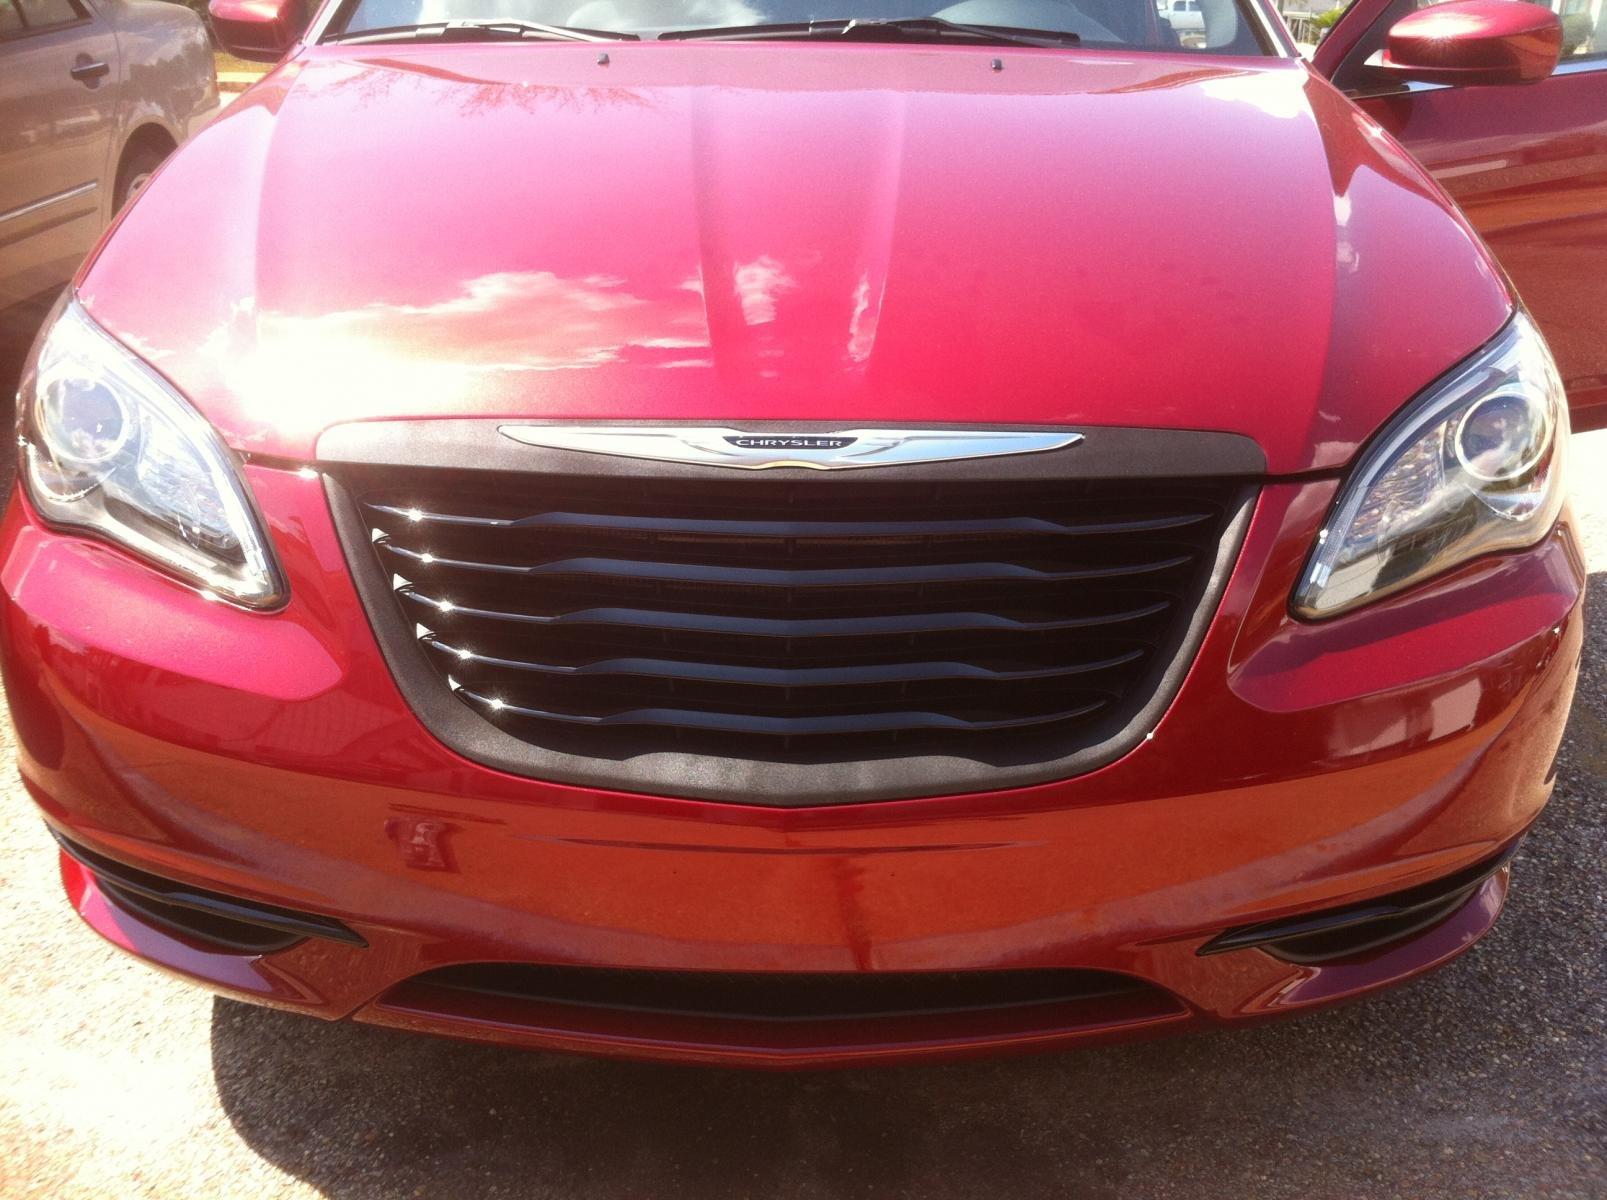 2012 Chrysler 200 Grill >> My 2012 Dark Cherry S ;)